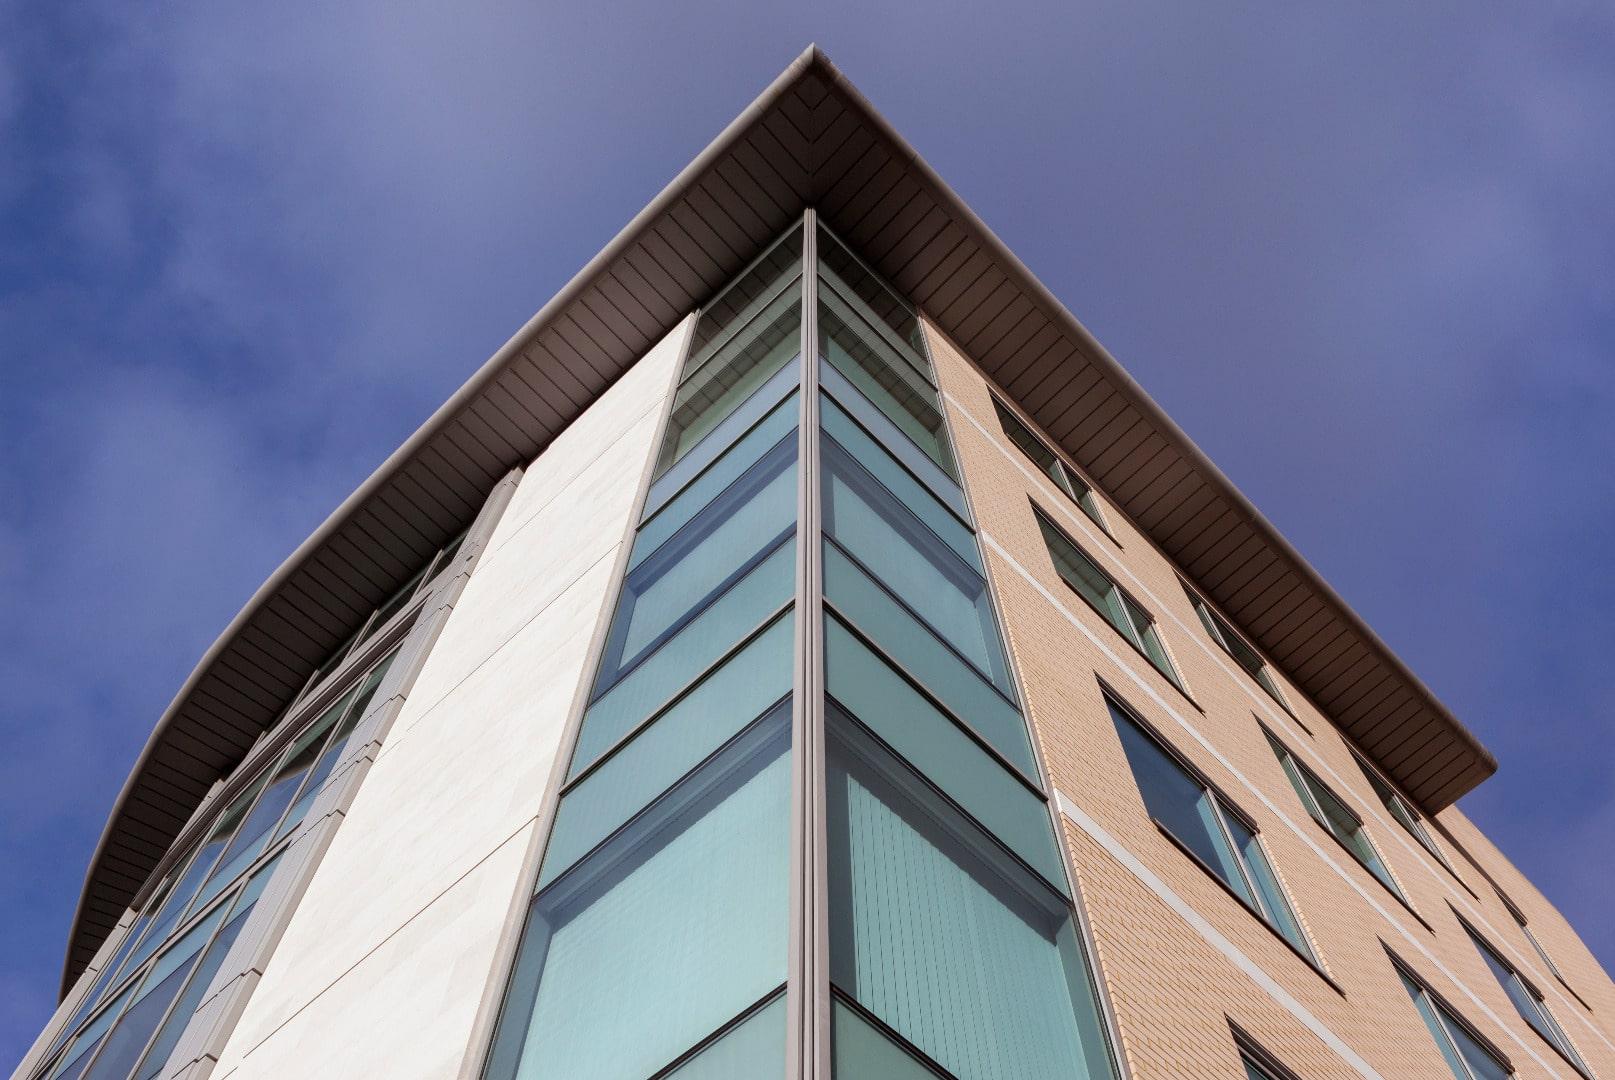 commercial aluminium windows and door price derby